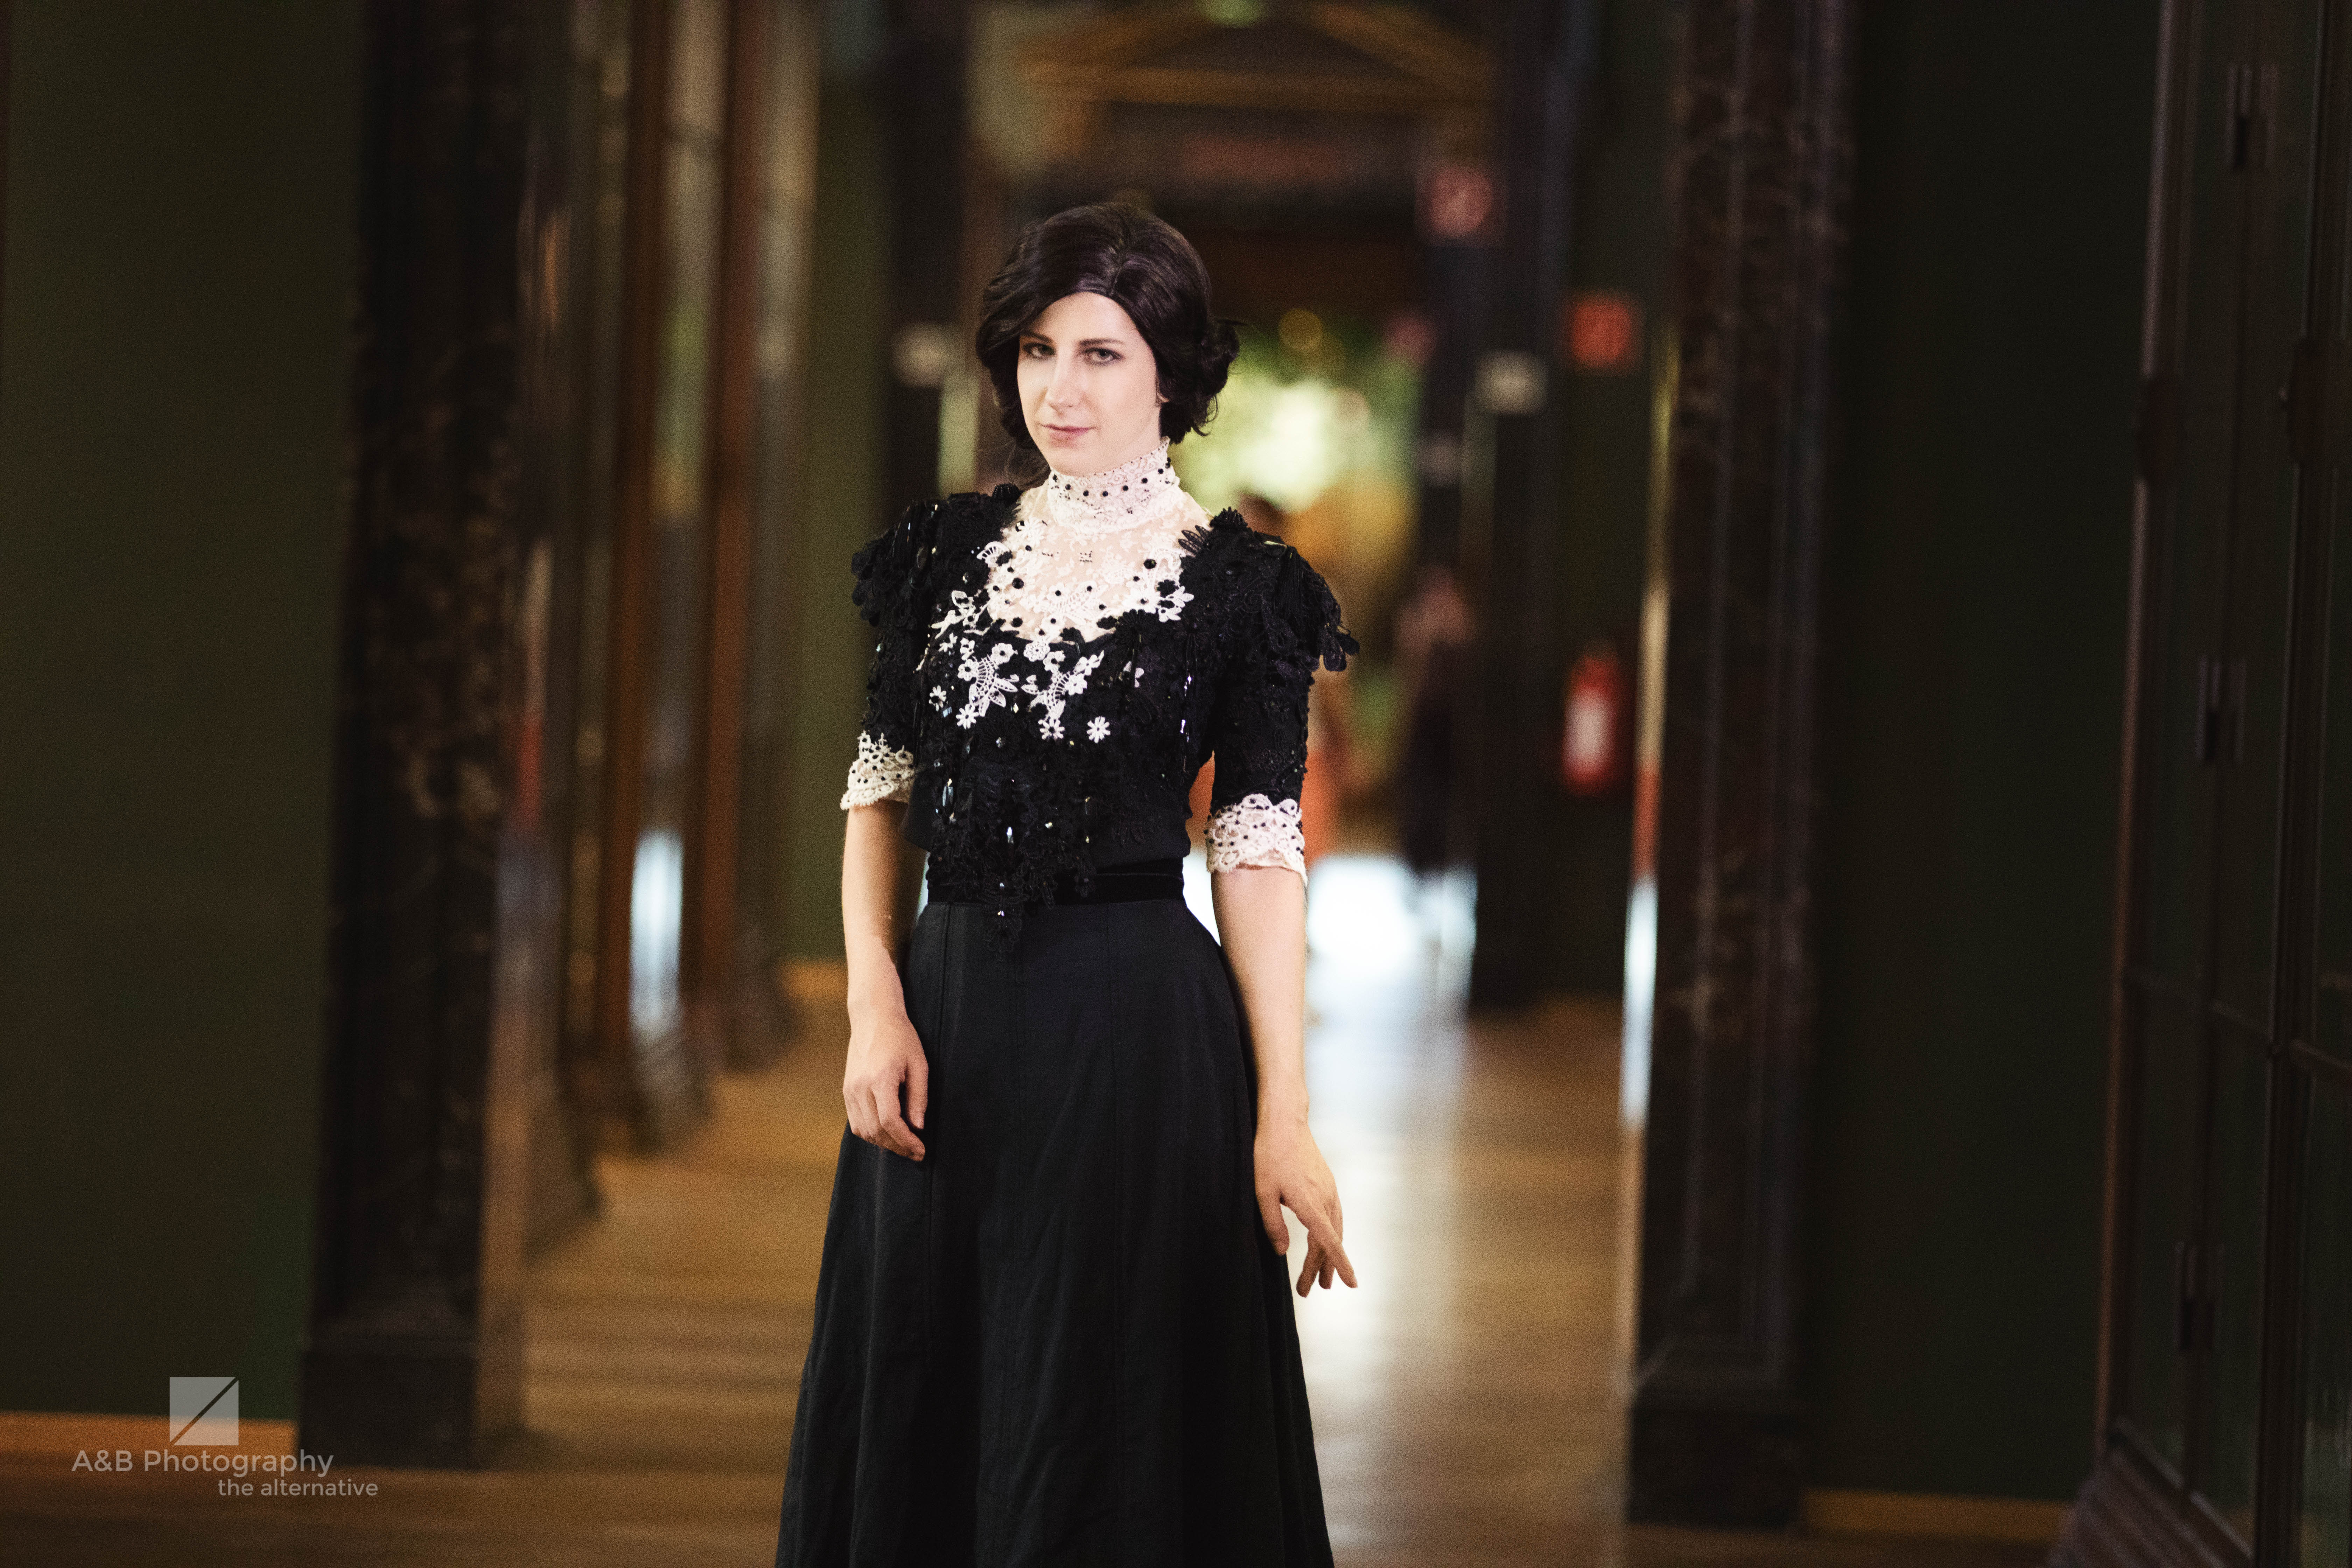 Vanessa Ives Penny Dreadful 19th century Costume